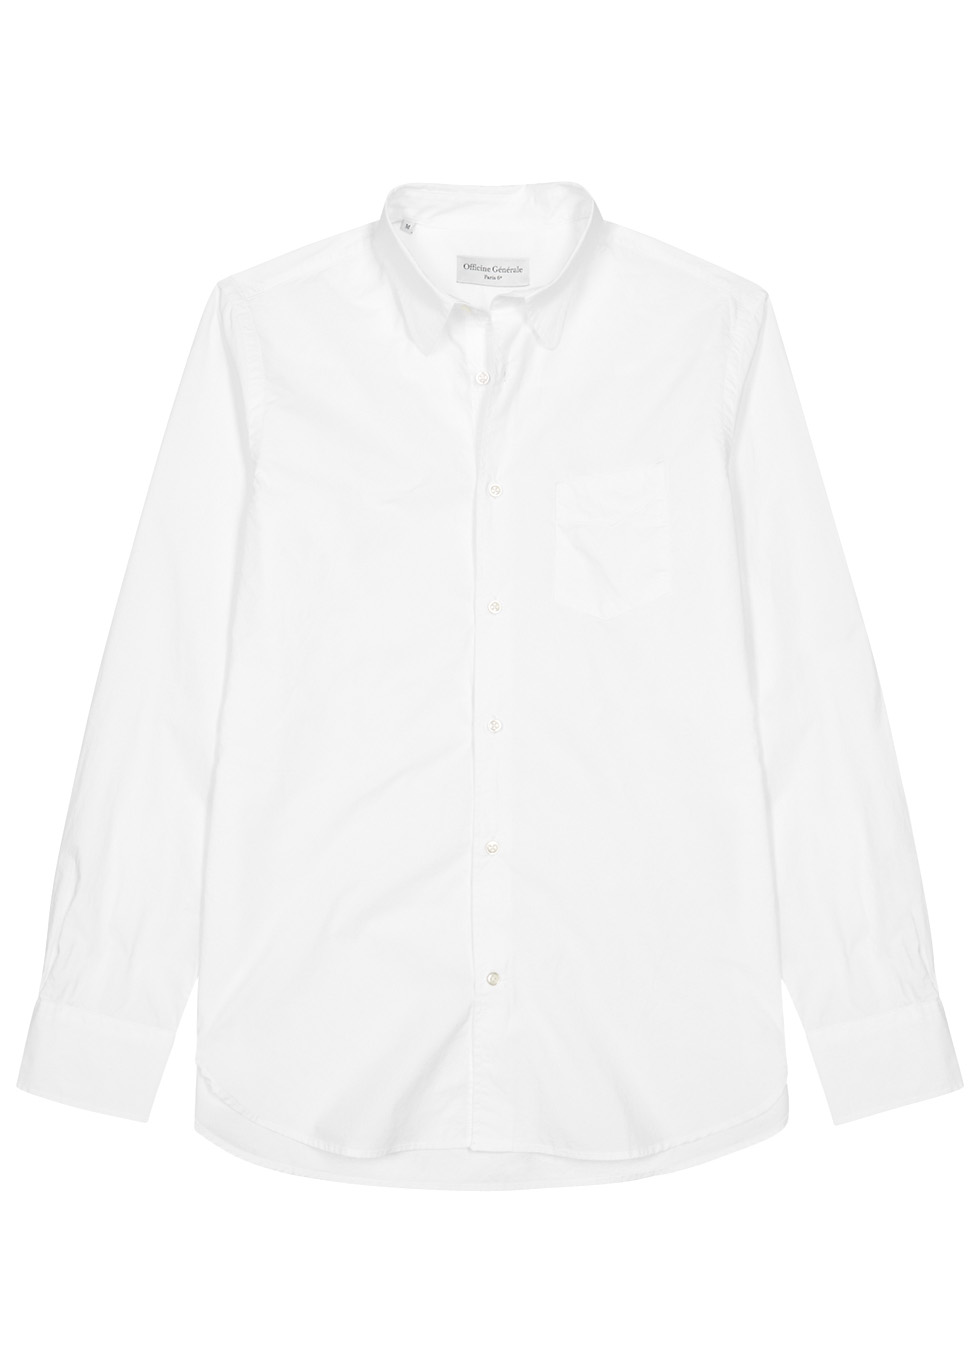 ... Benoit white poplin shirt. Officine Générale